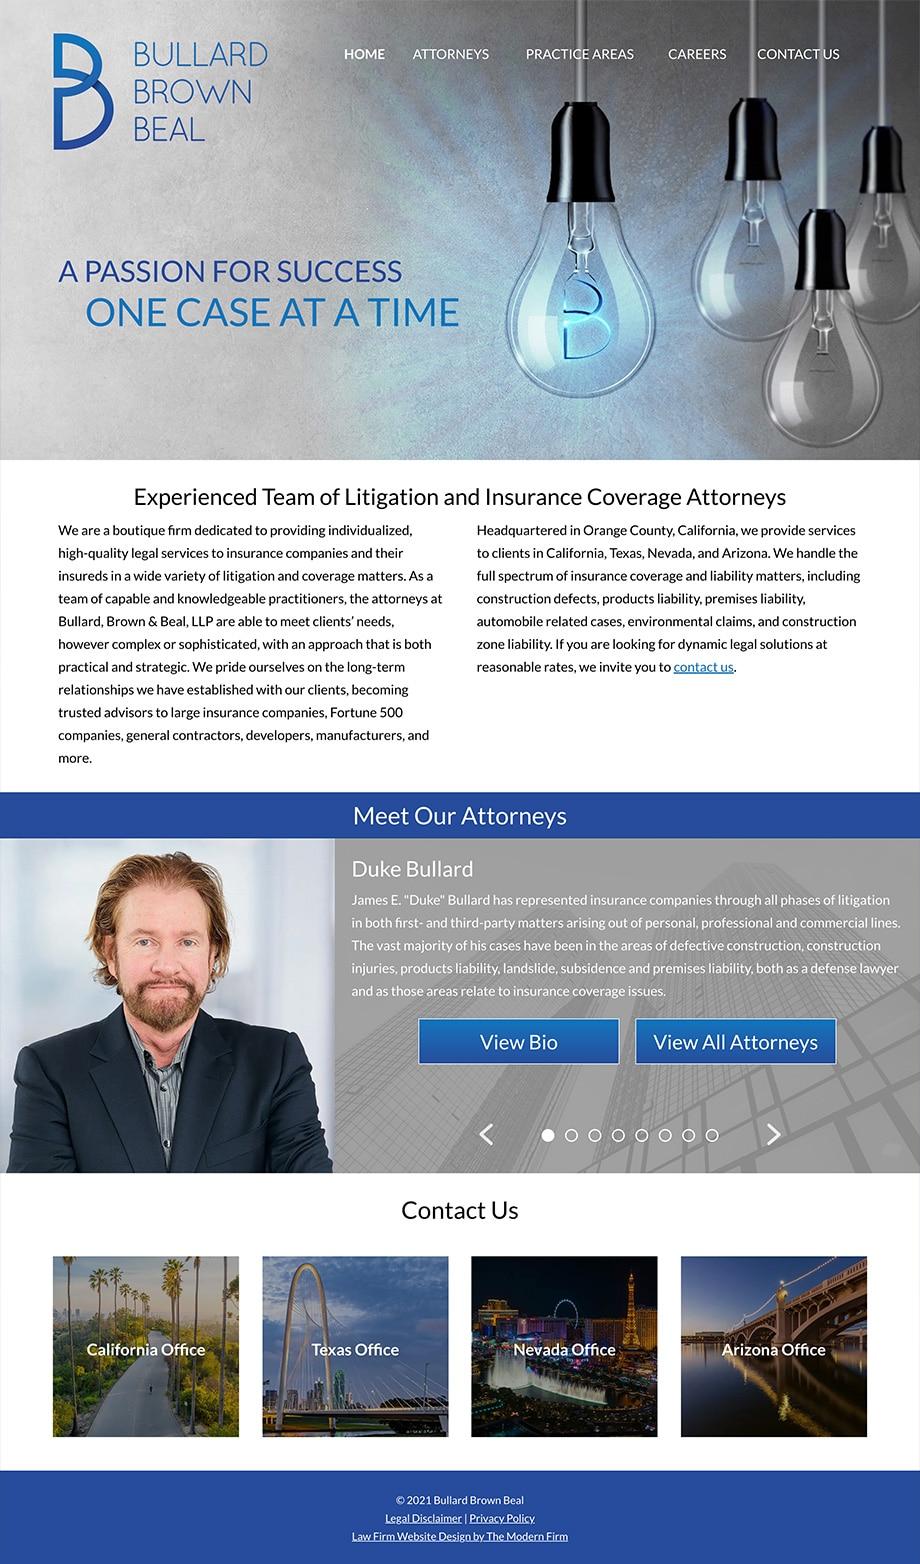 Law Firm Website Design for Bullard Brown Beal